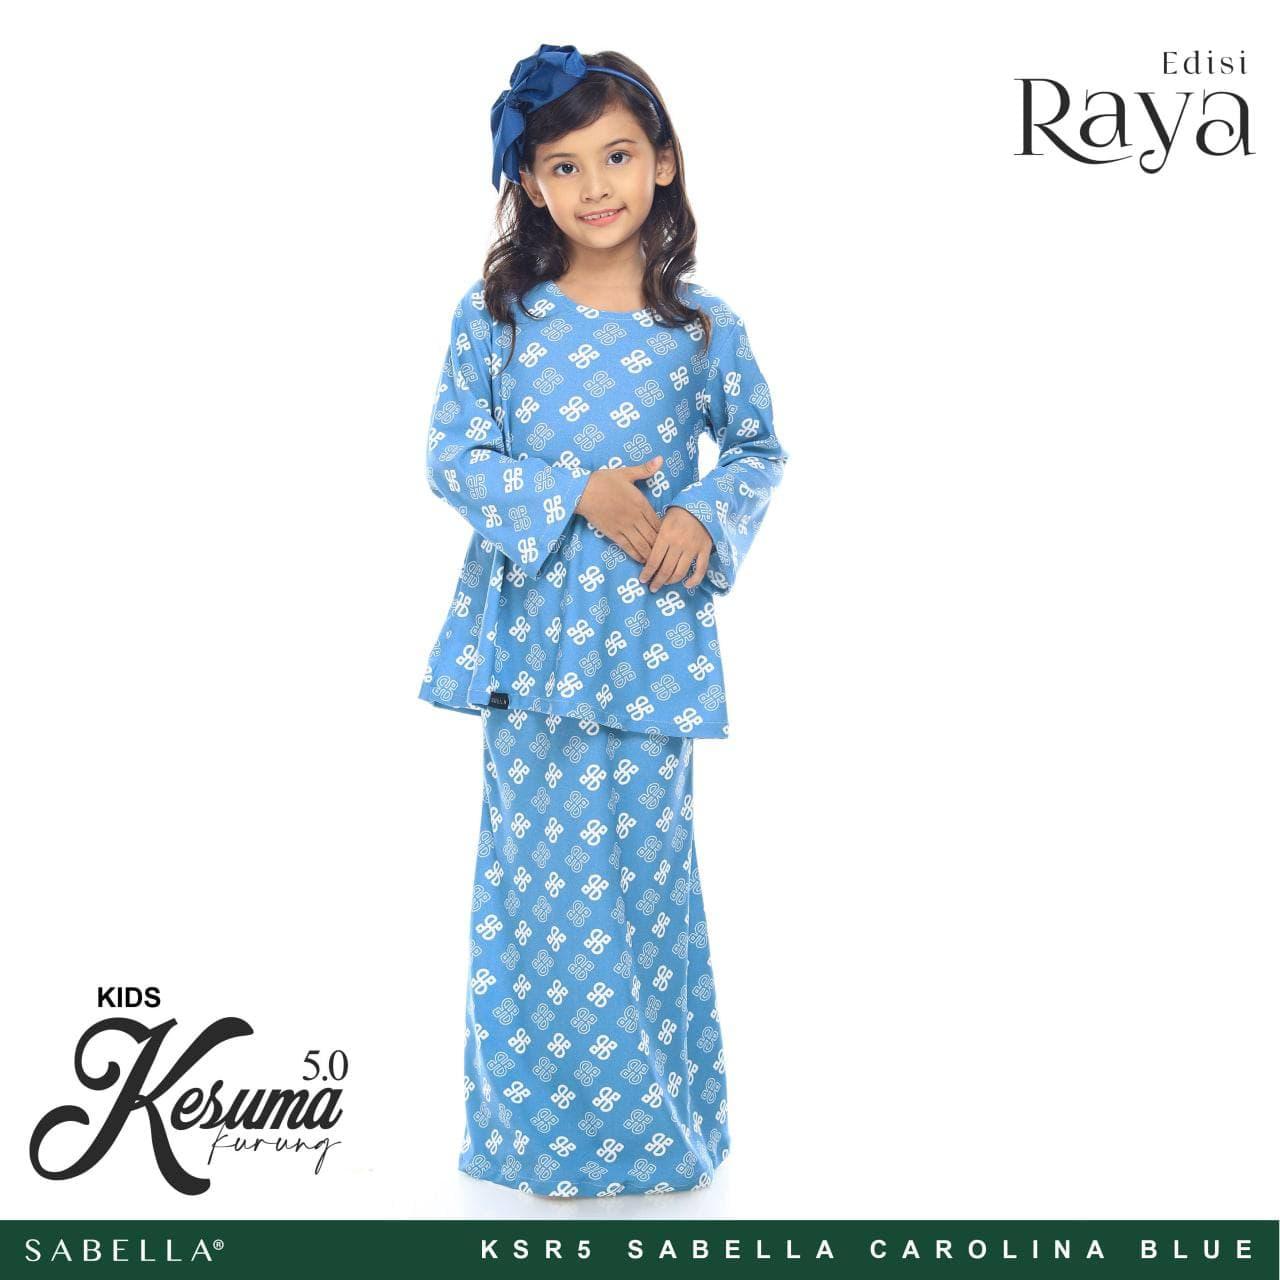 Kesuma Raya 5.0 Kids Sabella Carolina Blue